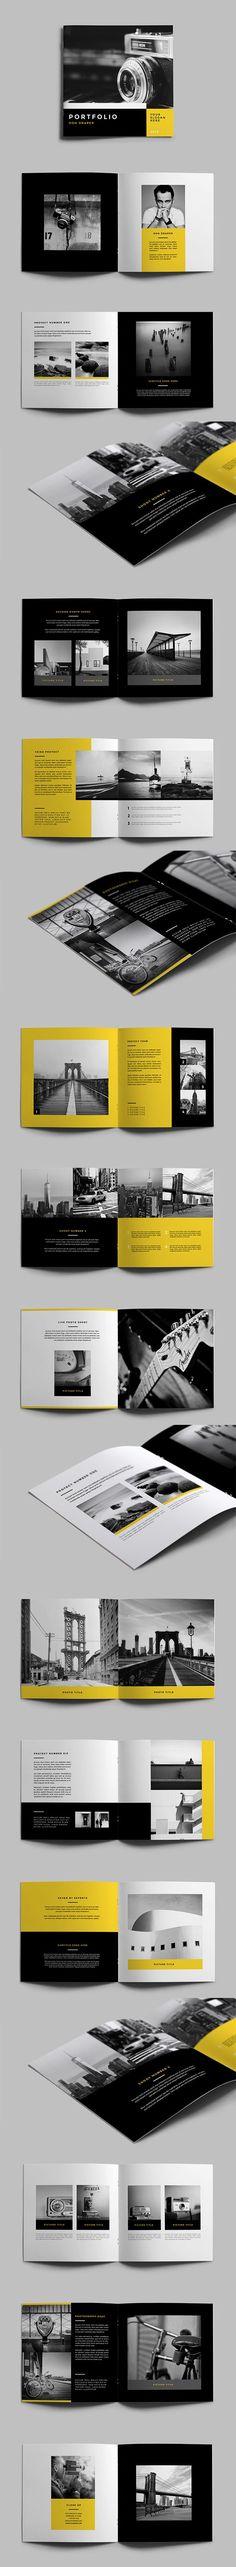 Simple Minimal Portfolio. Download here: http://graphicriver.net/item/simple-minimal-portfolio/11455547?ref=abradesign #portfolio #brochure #design: